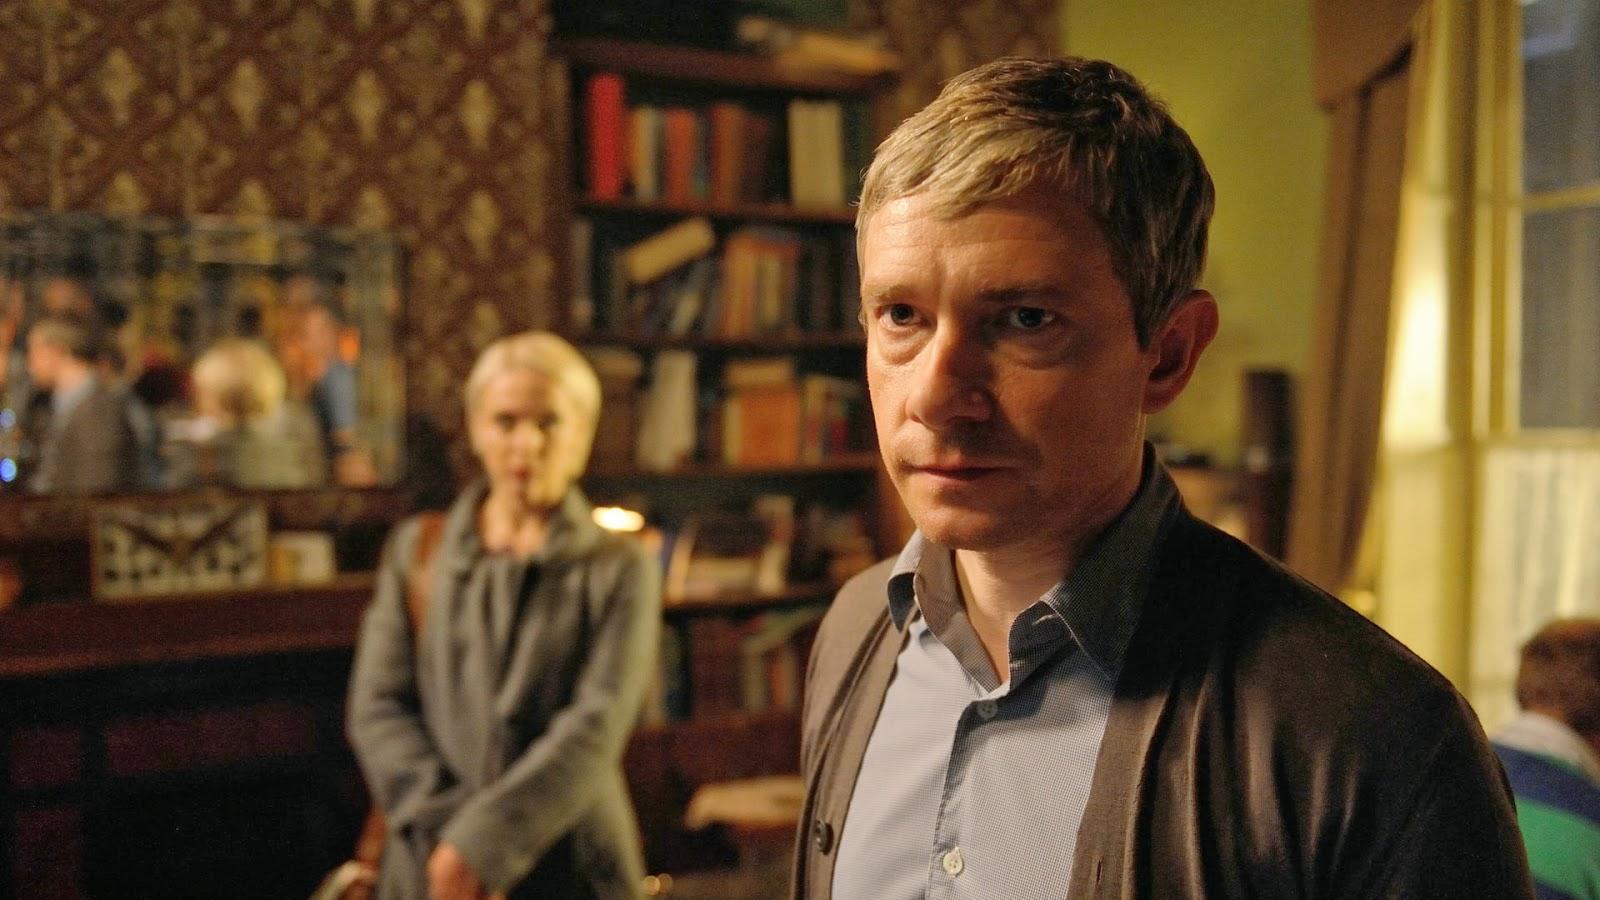 Martin Freeman and Amanda Abbington as John Watson and Mary Morstan in BBC Sherlock Season 3 Episode 3 His Last Vow